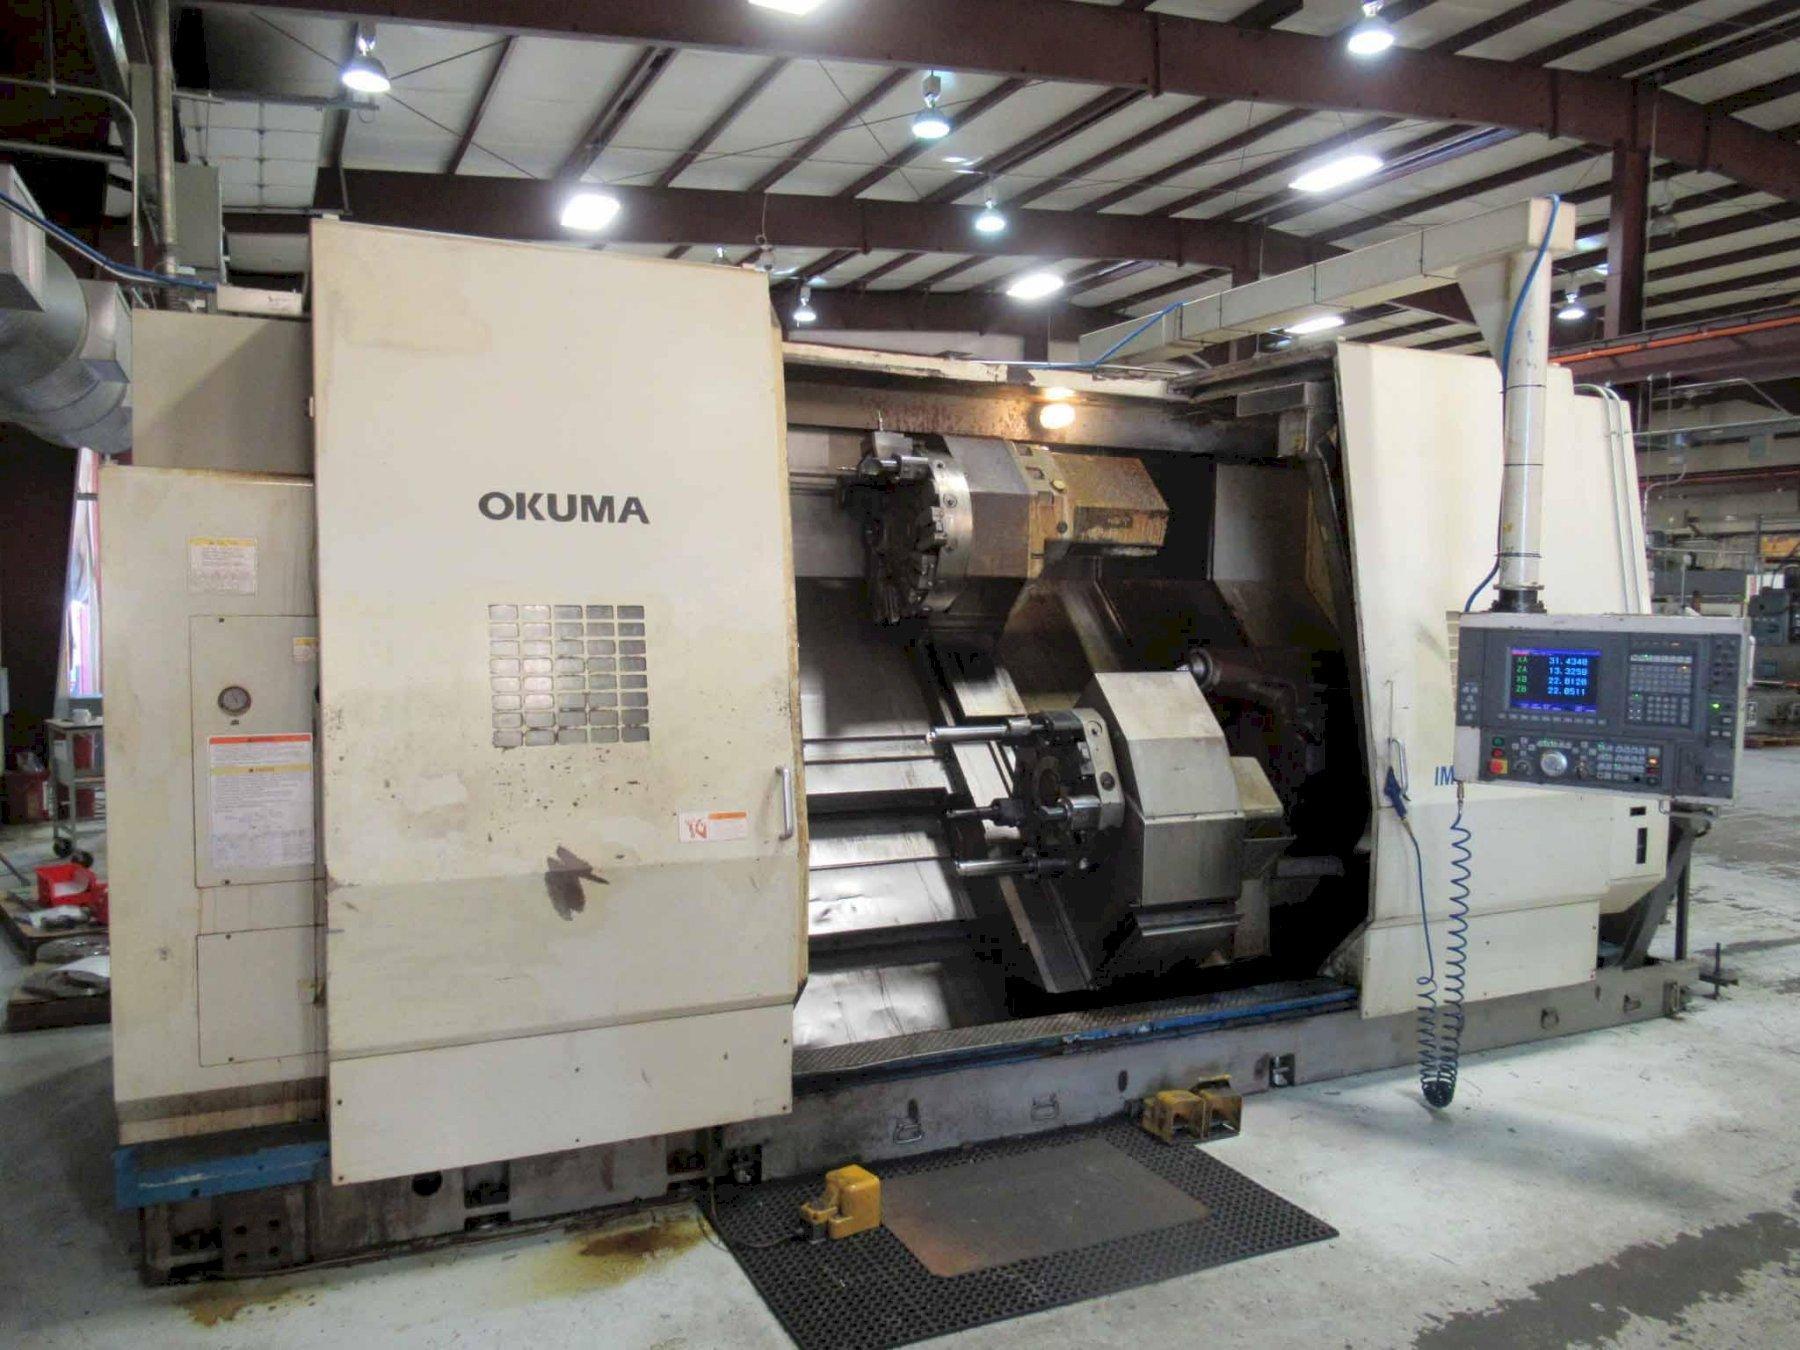 OKUMA IMPACT LU45M CNC LATHE 4-AXIS CNC LATHE 1995